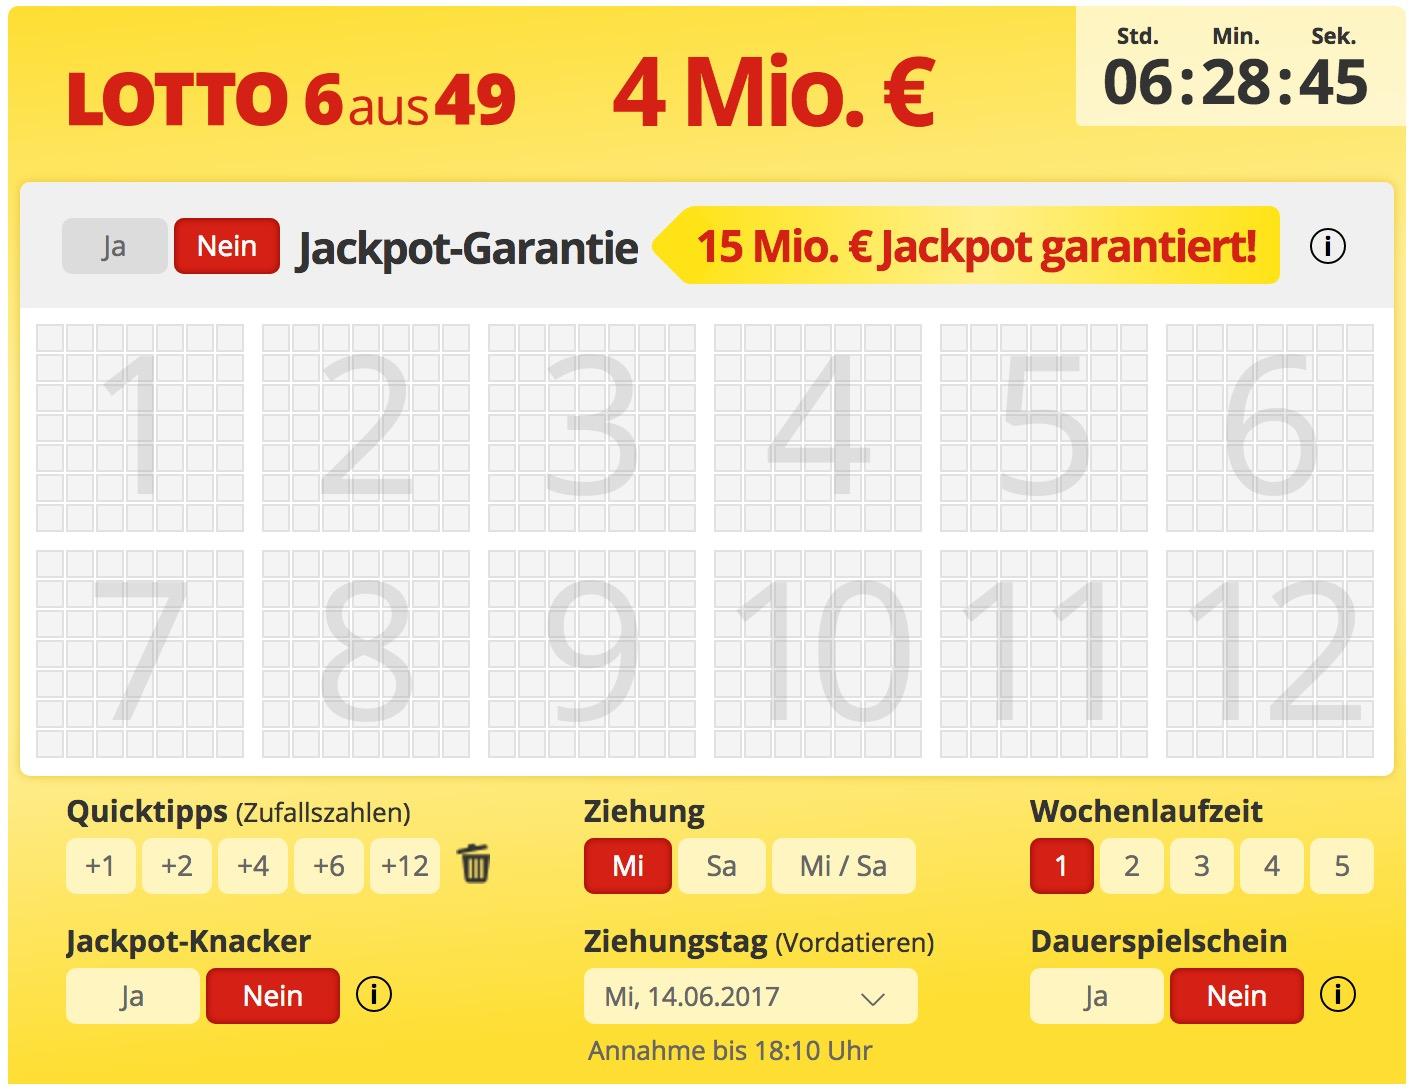 Bis Wann Kann Man Heute Lotto Spielen